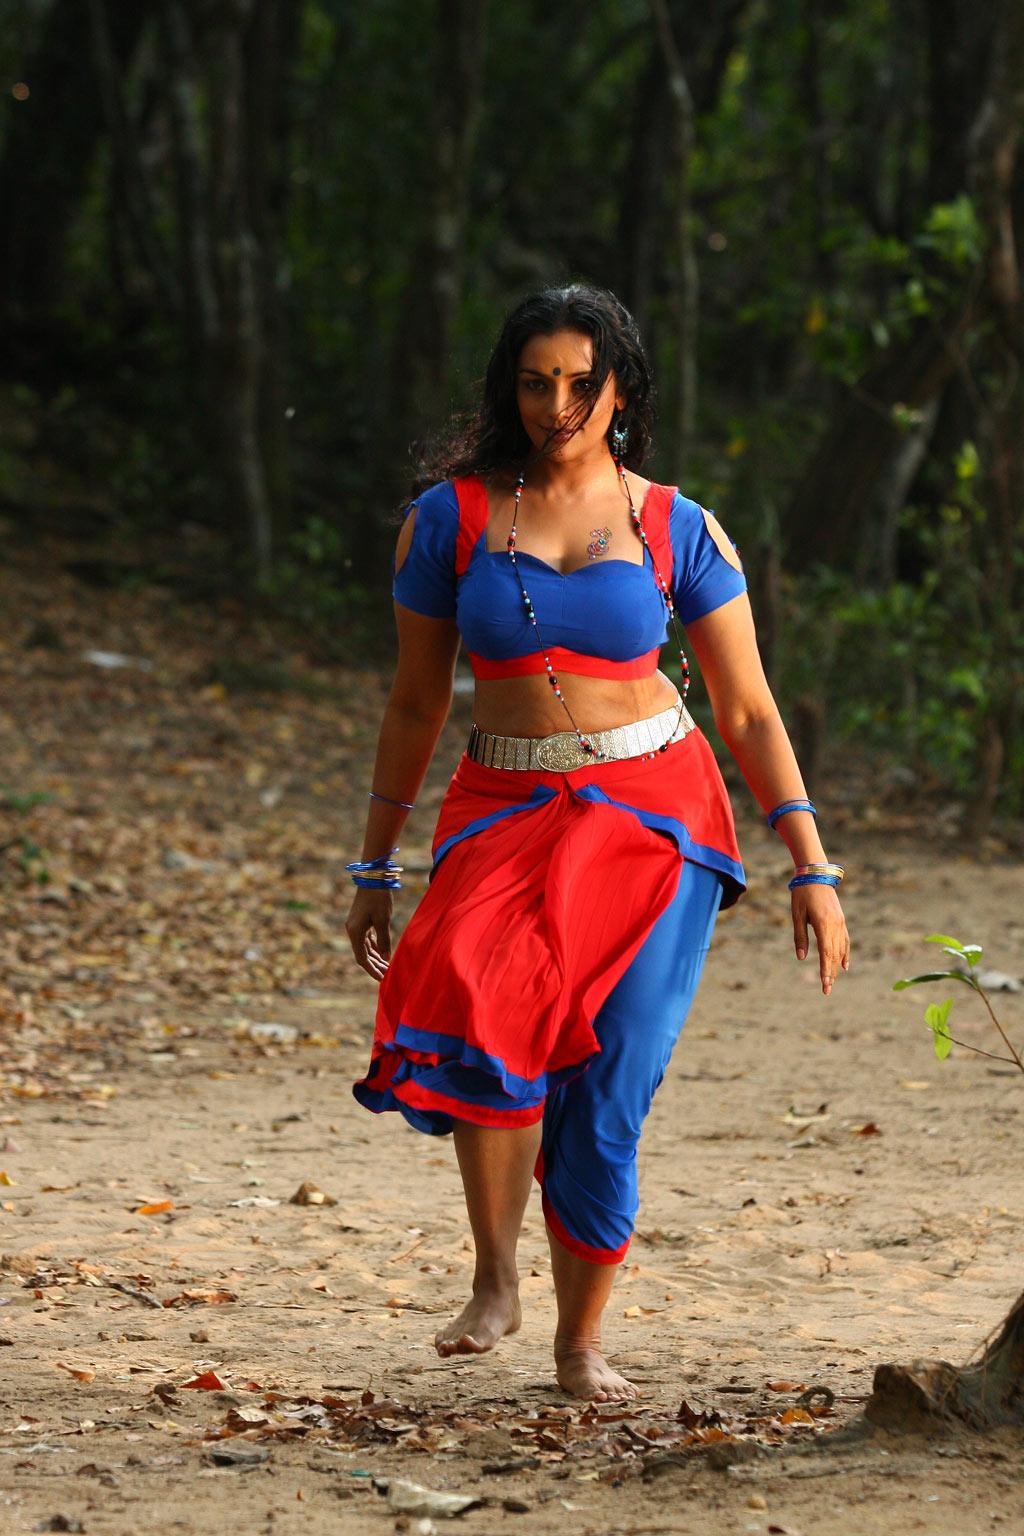 Mallu Actress Shweta Menon Hot Navel Show And Hot and Sexy Photos